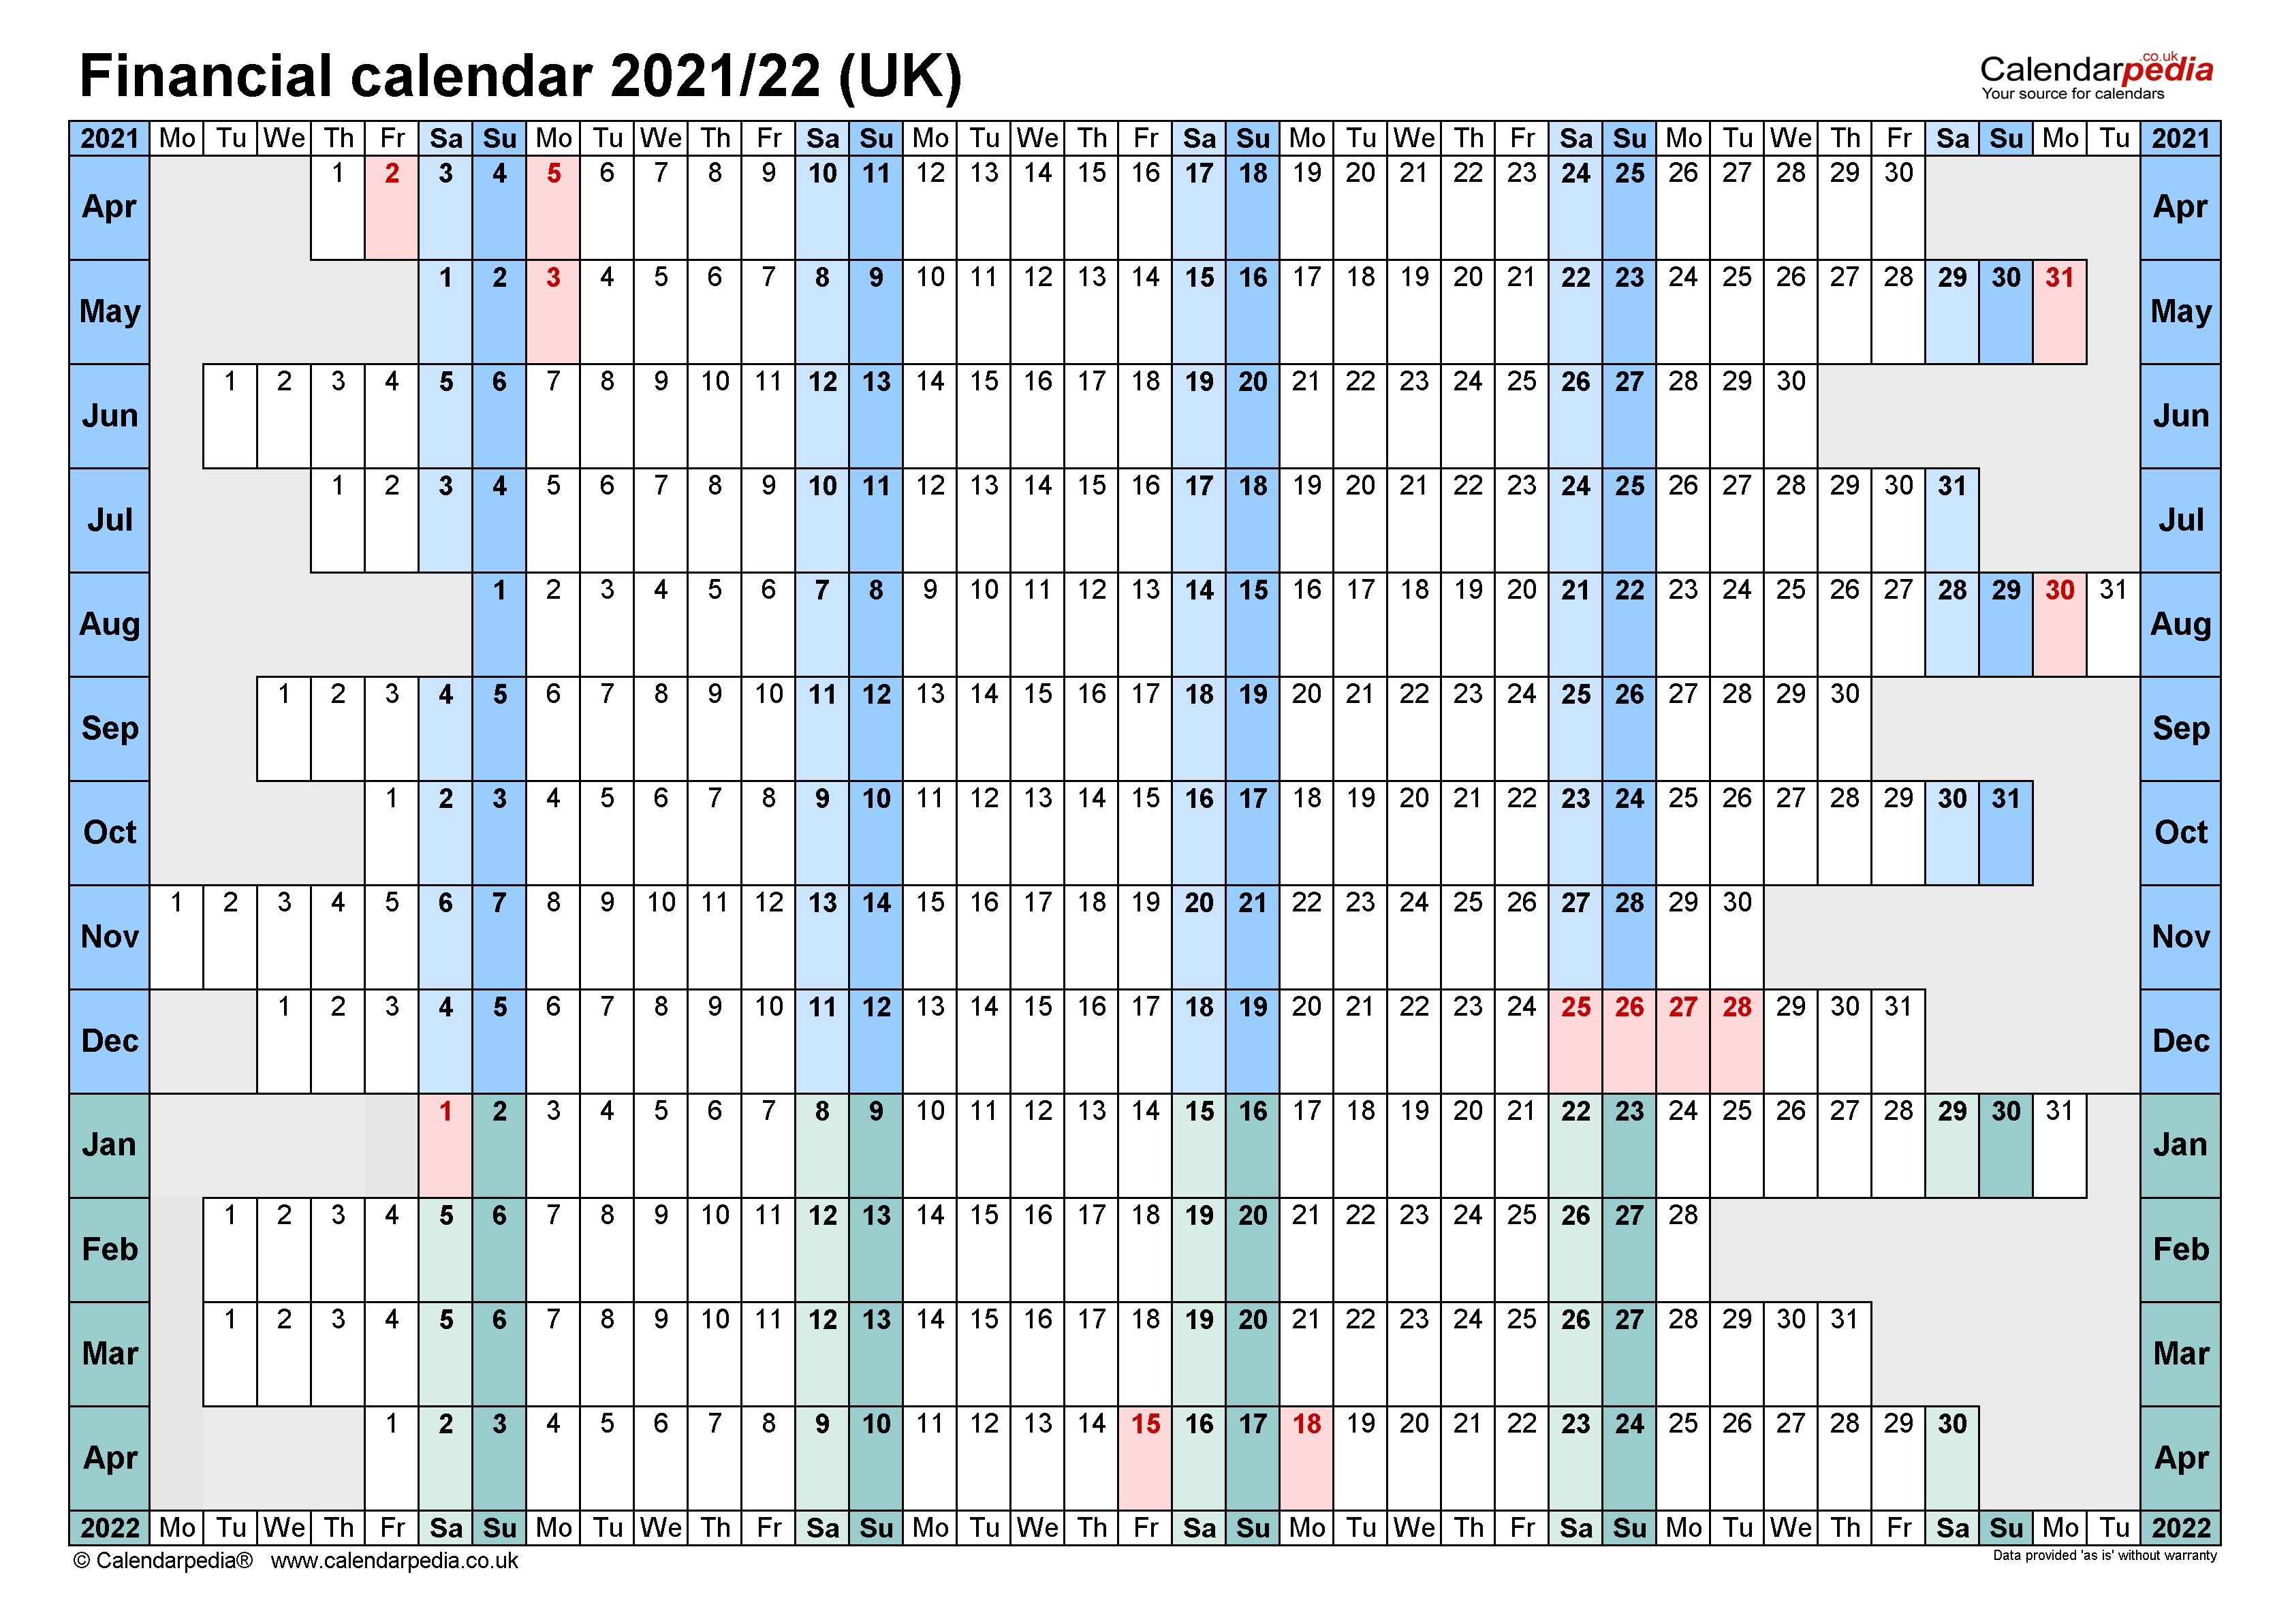 Financial Calendars 2021/22 (Uk) In Pdf Format  2021-19 Financial Calendar Dates